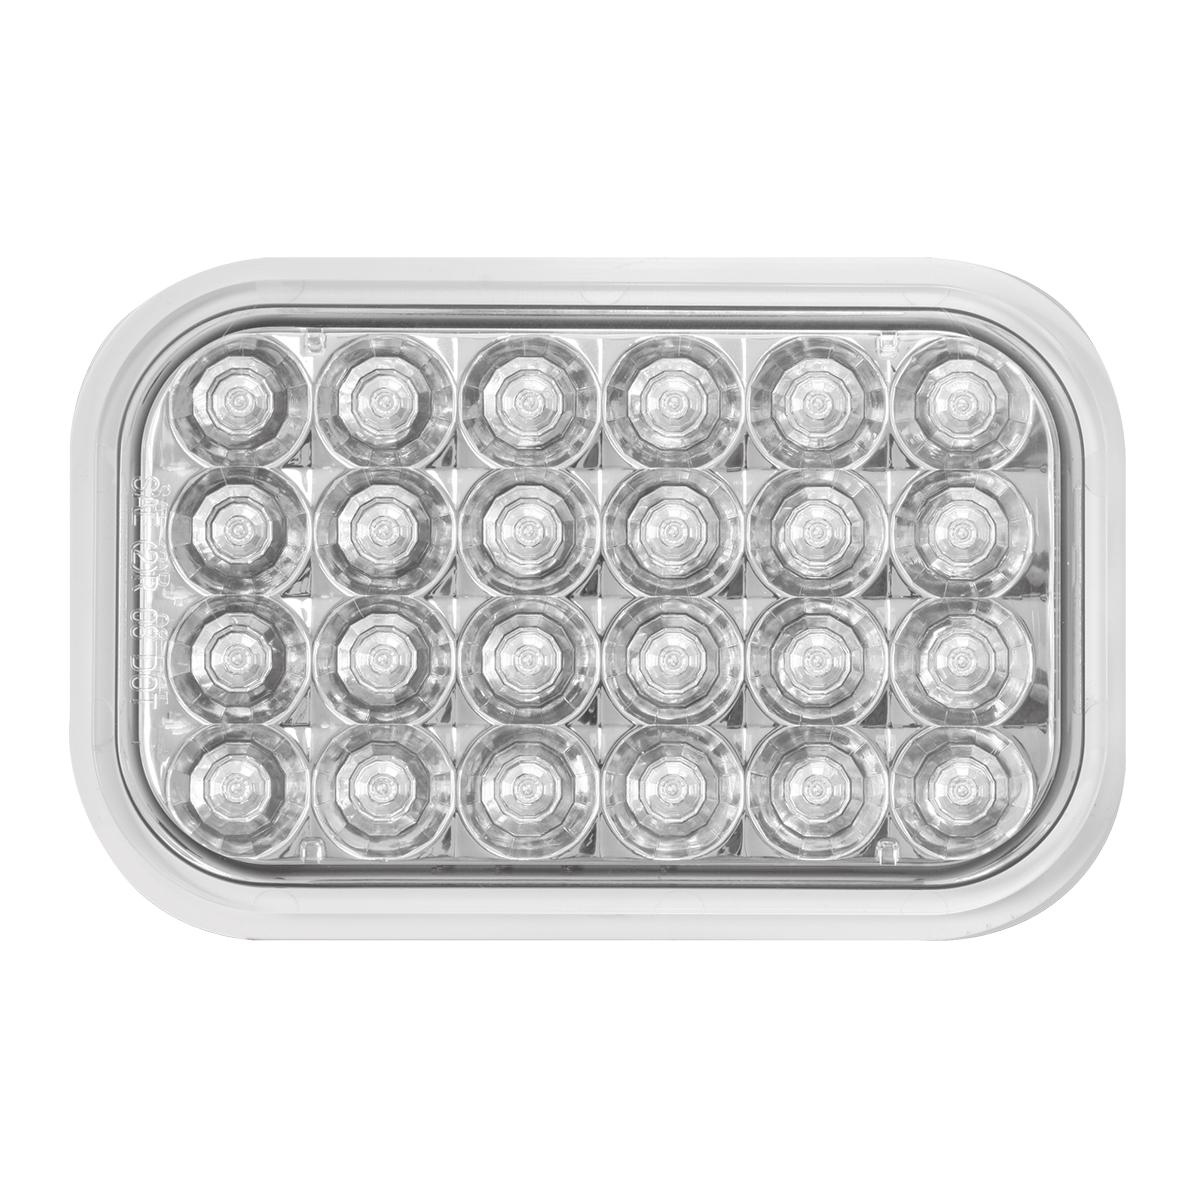 77184 Rectangular Pearl LED Light in White/Clear